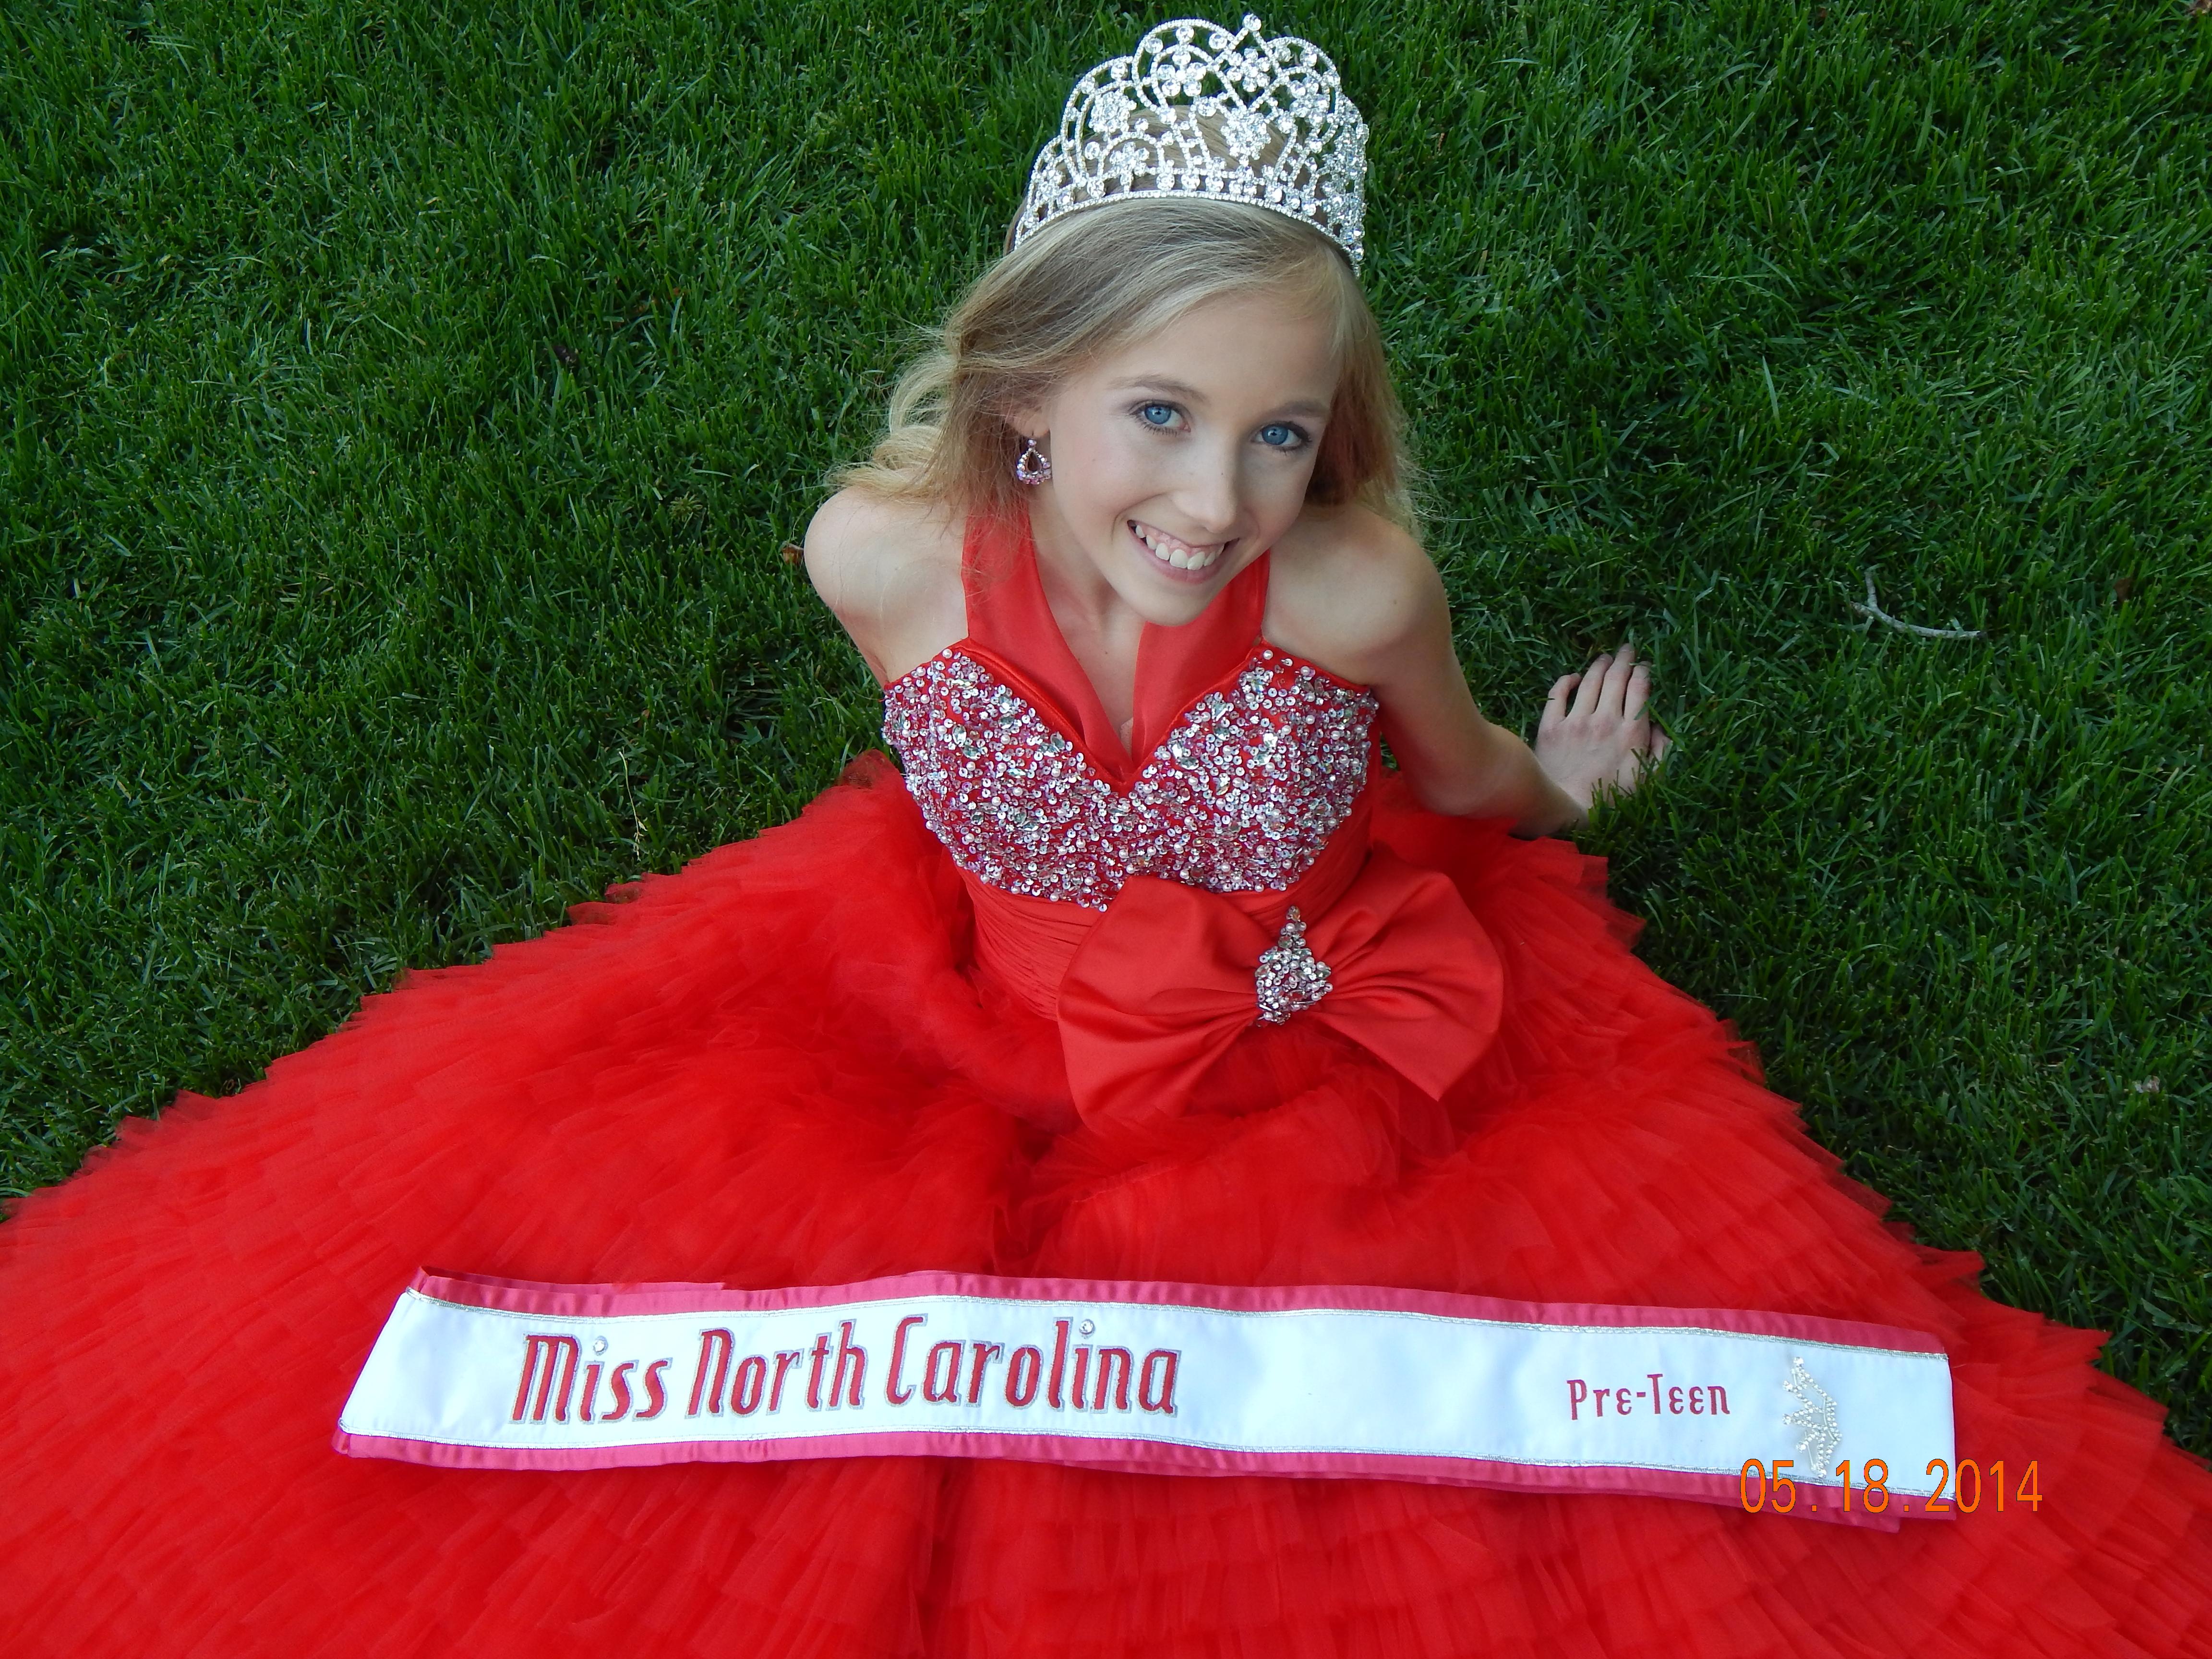 Royalty Letter from Brandi Alden, Miss North Carolina Pre-teen!